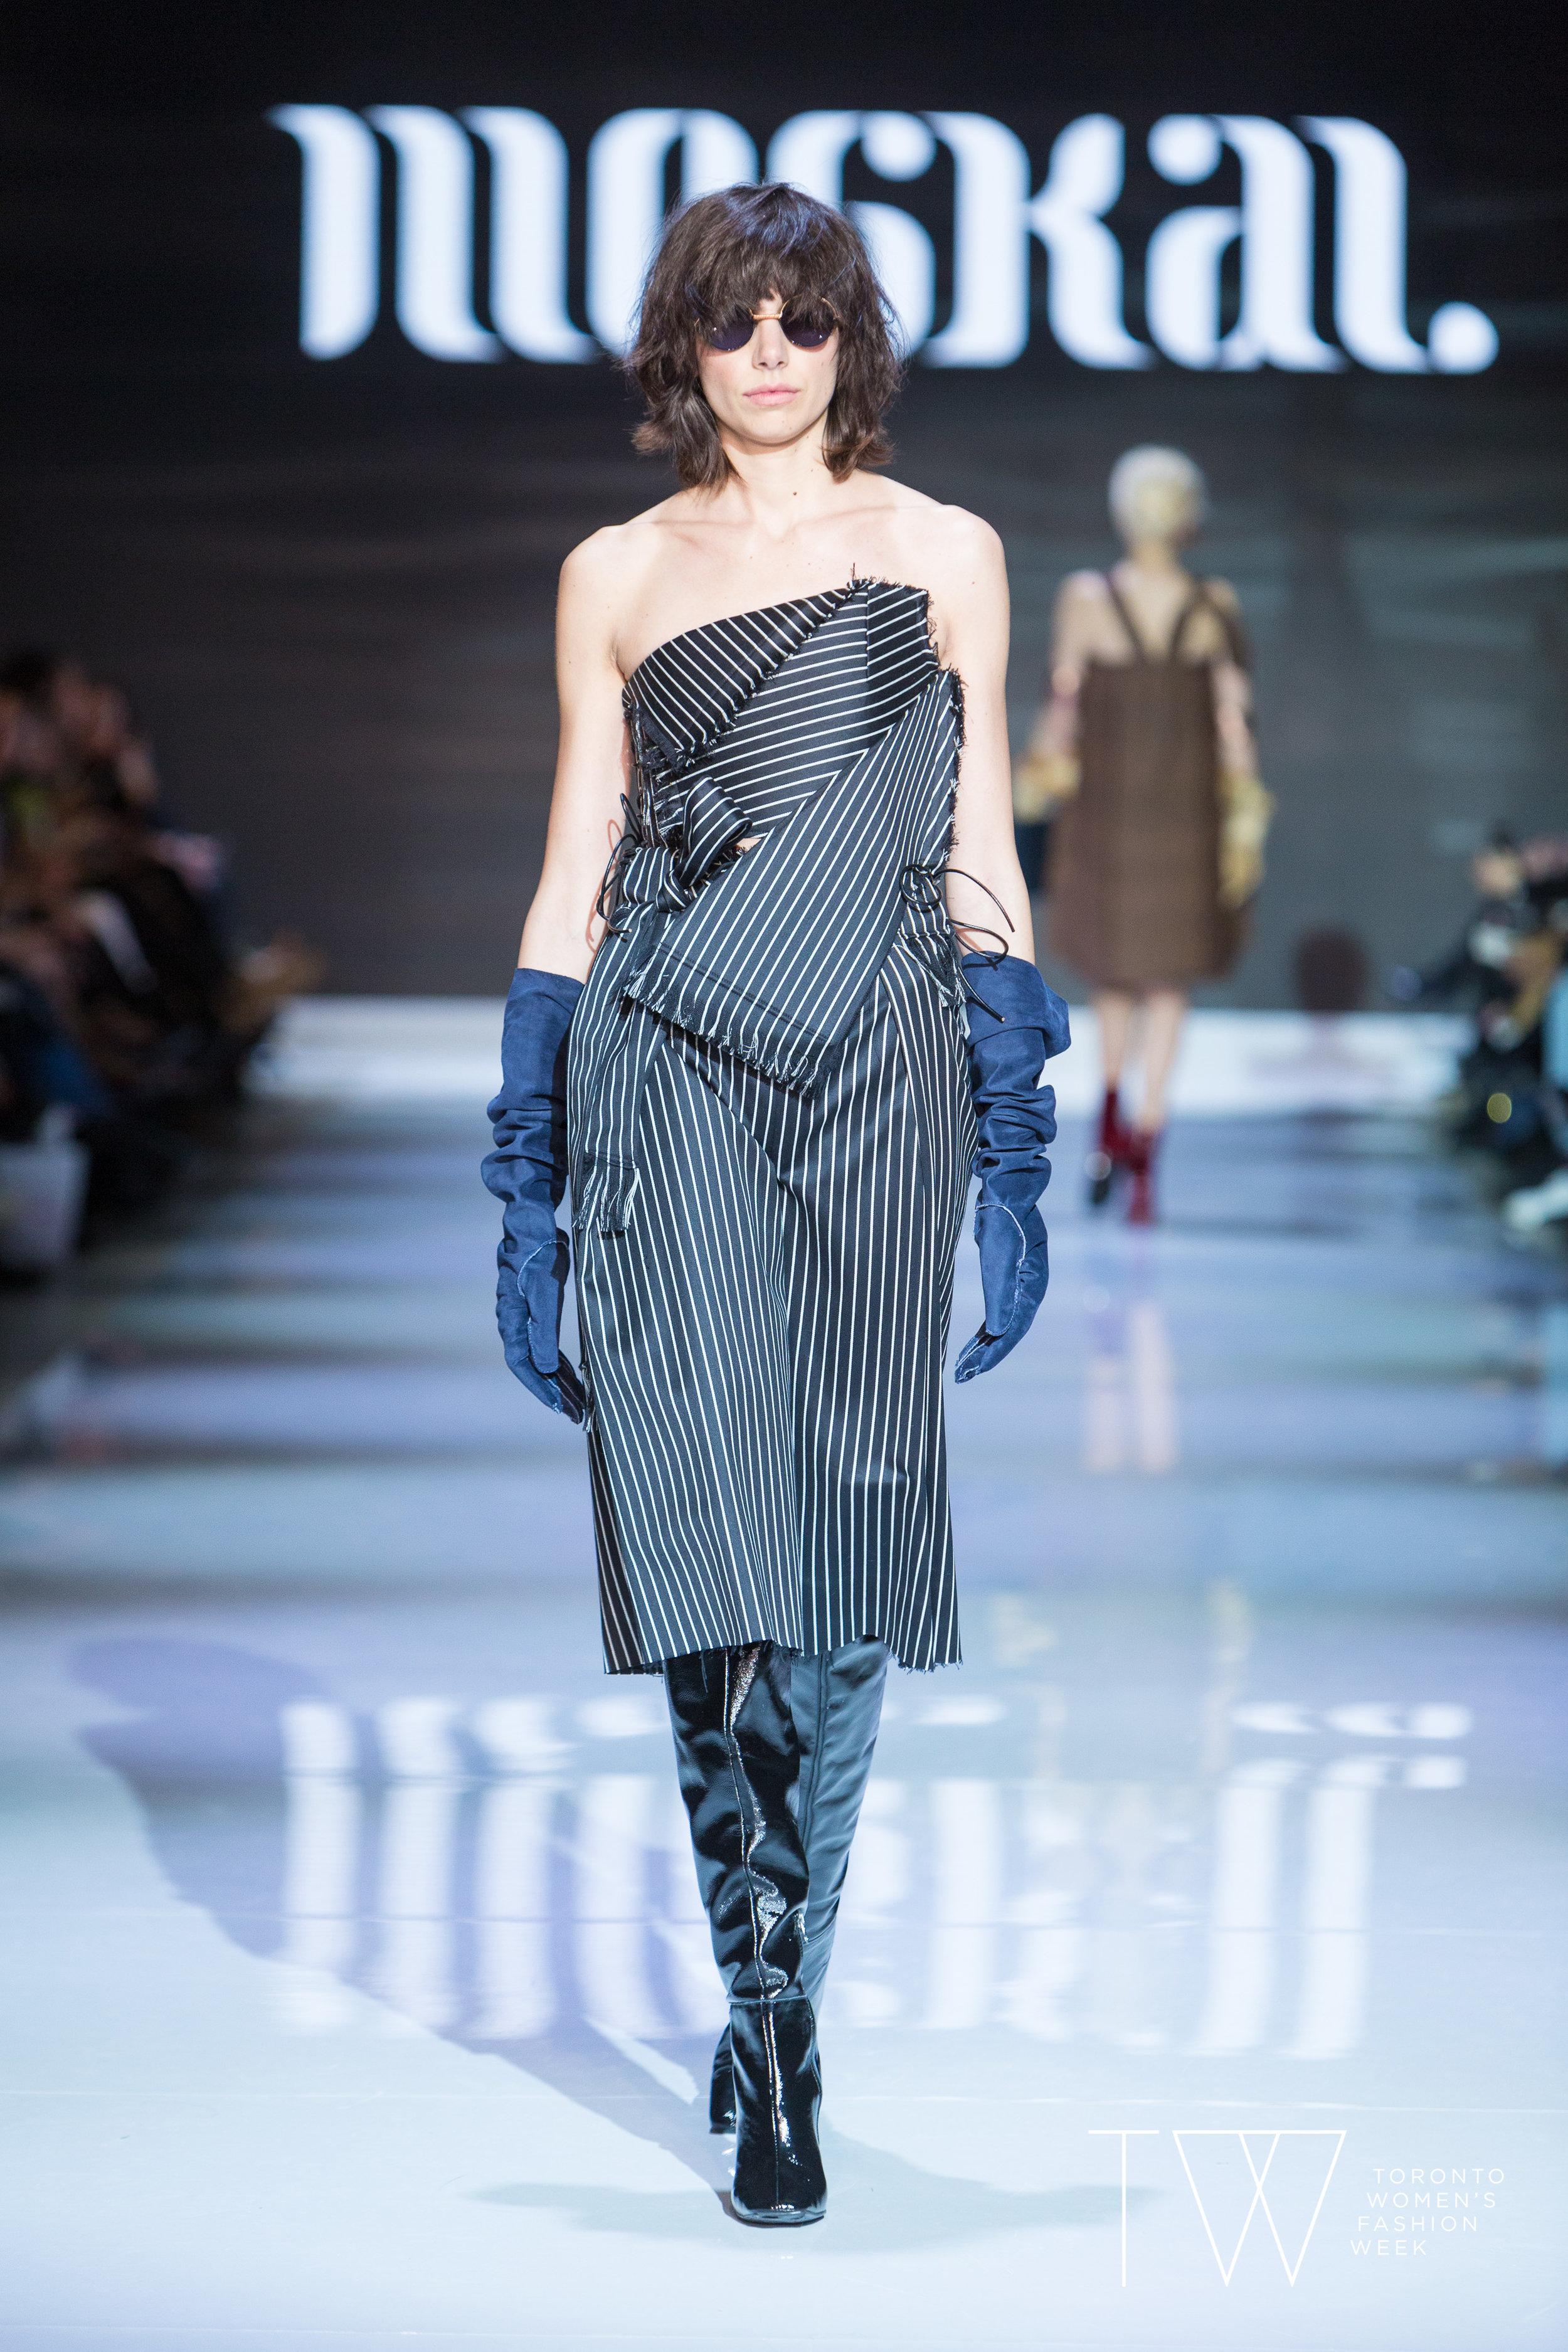 Moskal image courtesy of Toronto Women's Fashion Week